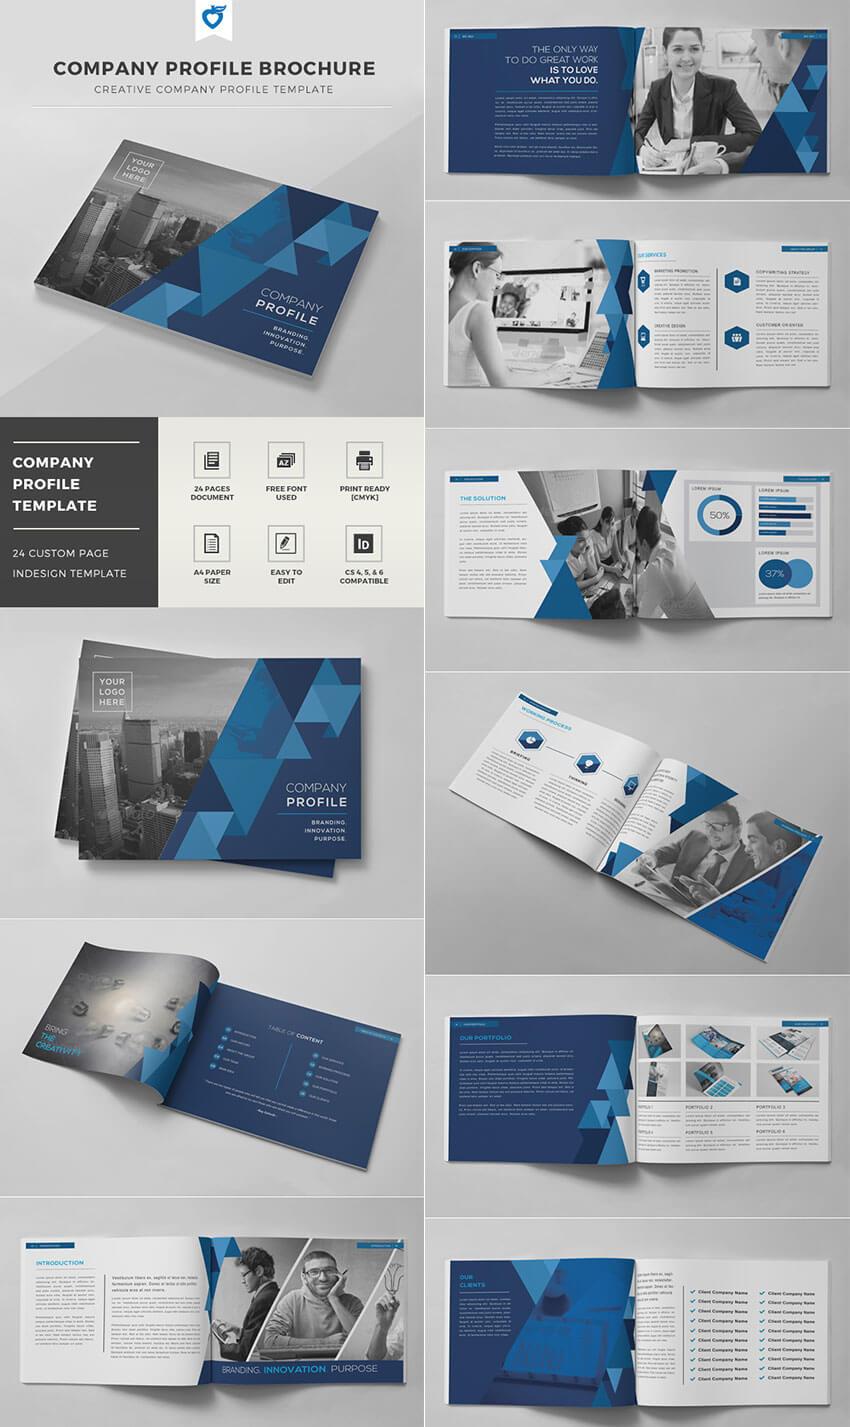 30 Best Indesign Brochure Templates - Creative Business In Brochure Templates Free Download Indesign